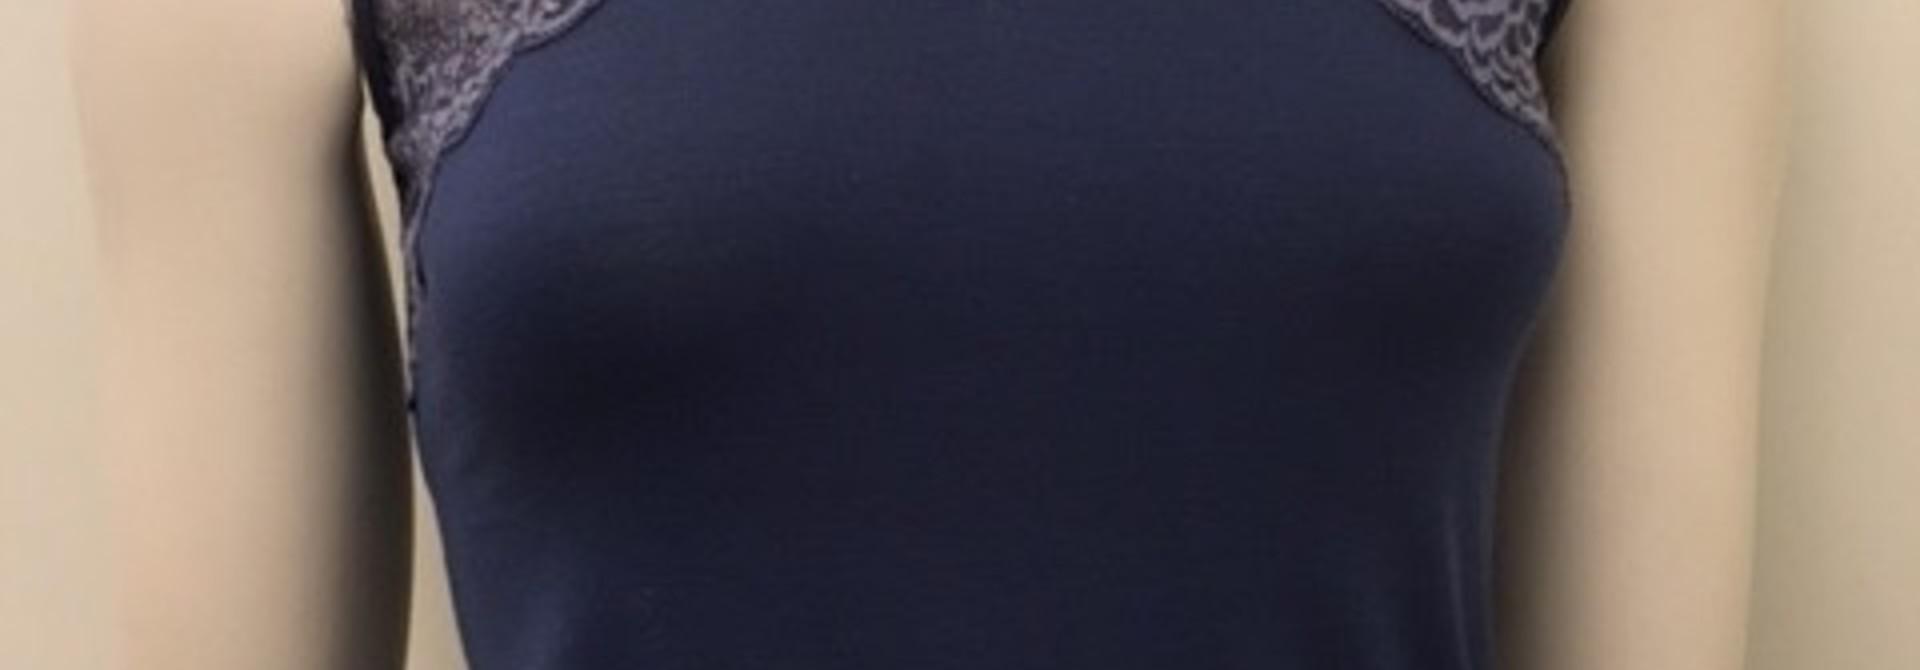 Hemd met kant Greta 1045546 - dark denim